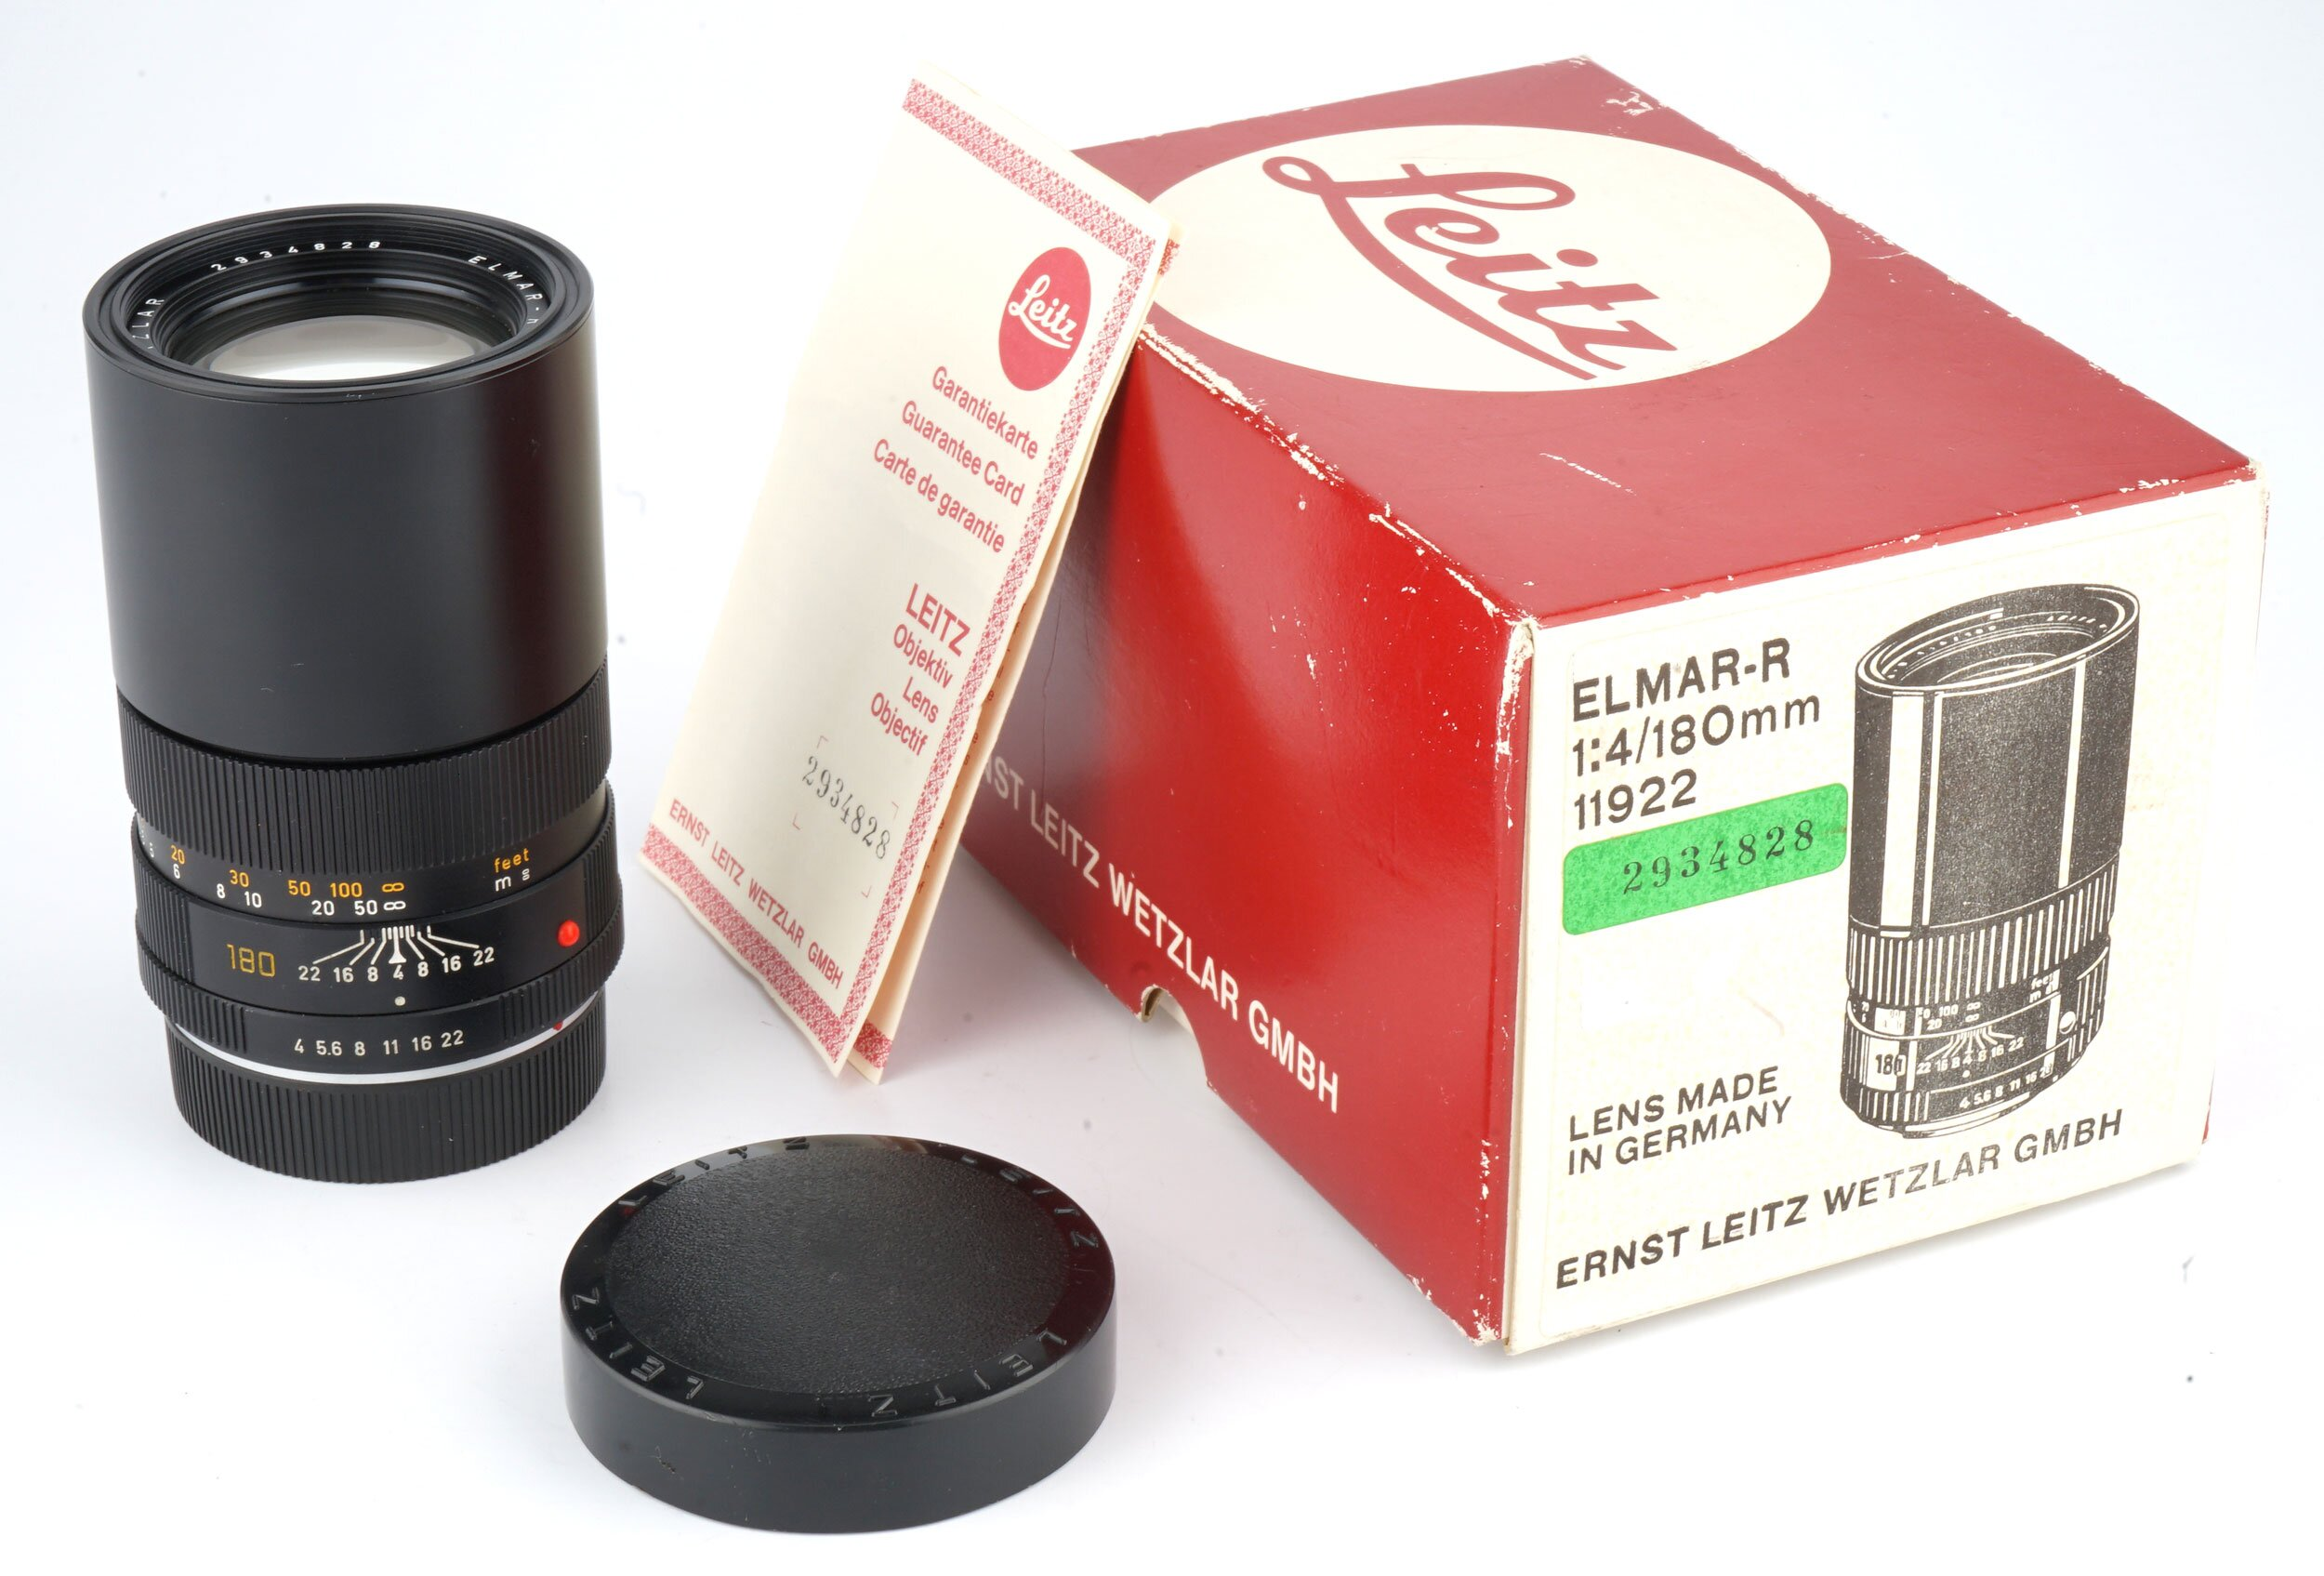 Leica Elmarit-R F4 180mm 3CAM 11922